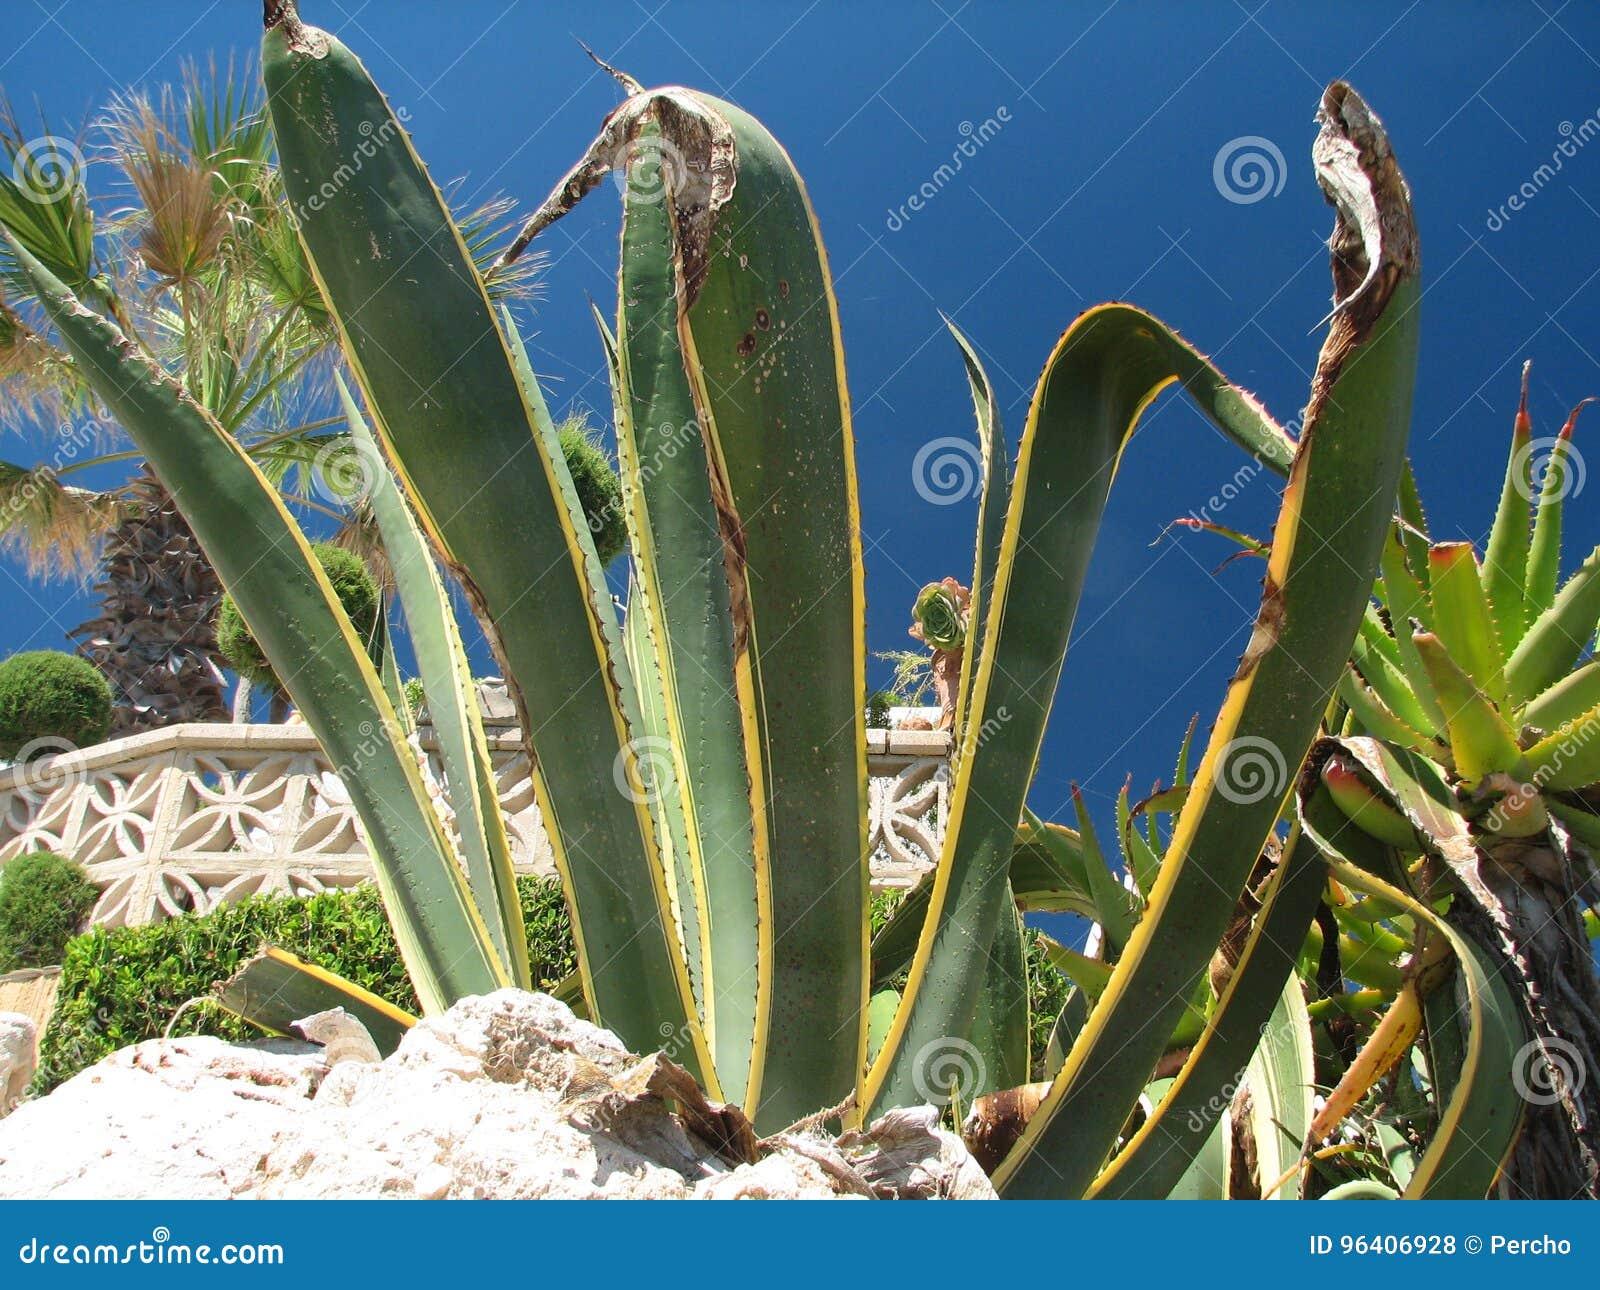 agave americana marginata stockfoto bild von agave wache 96406928. Black Bedroom Furniture Sets. Home Design Ideas